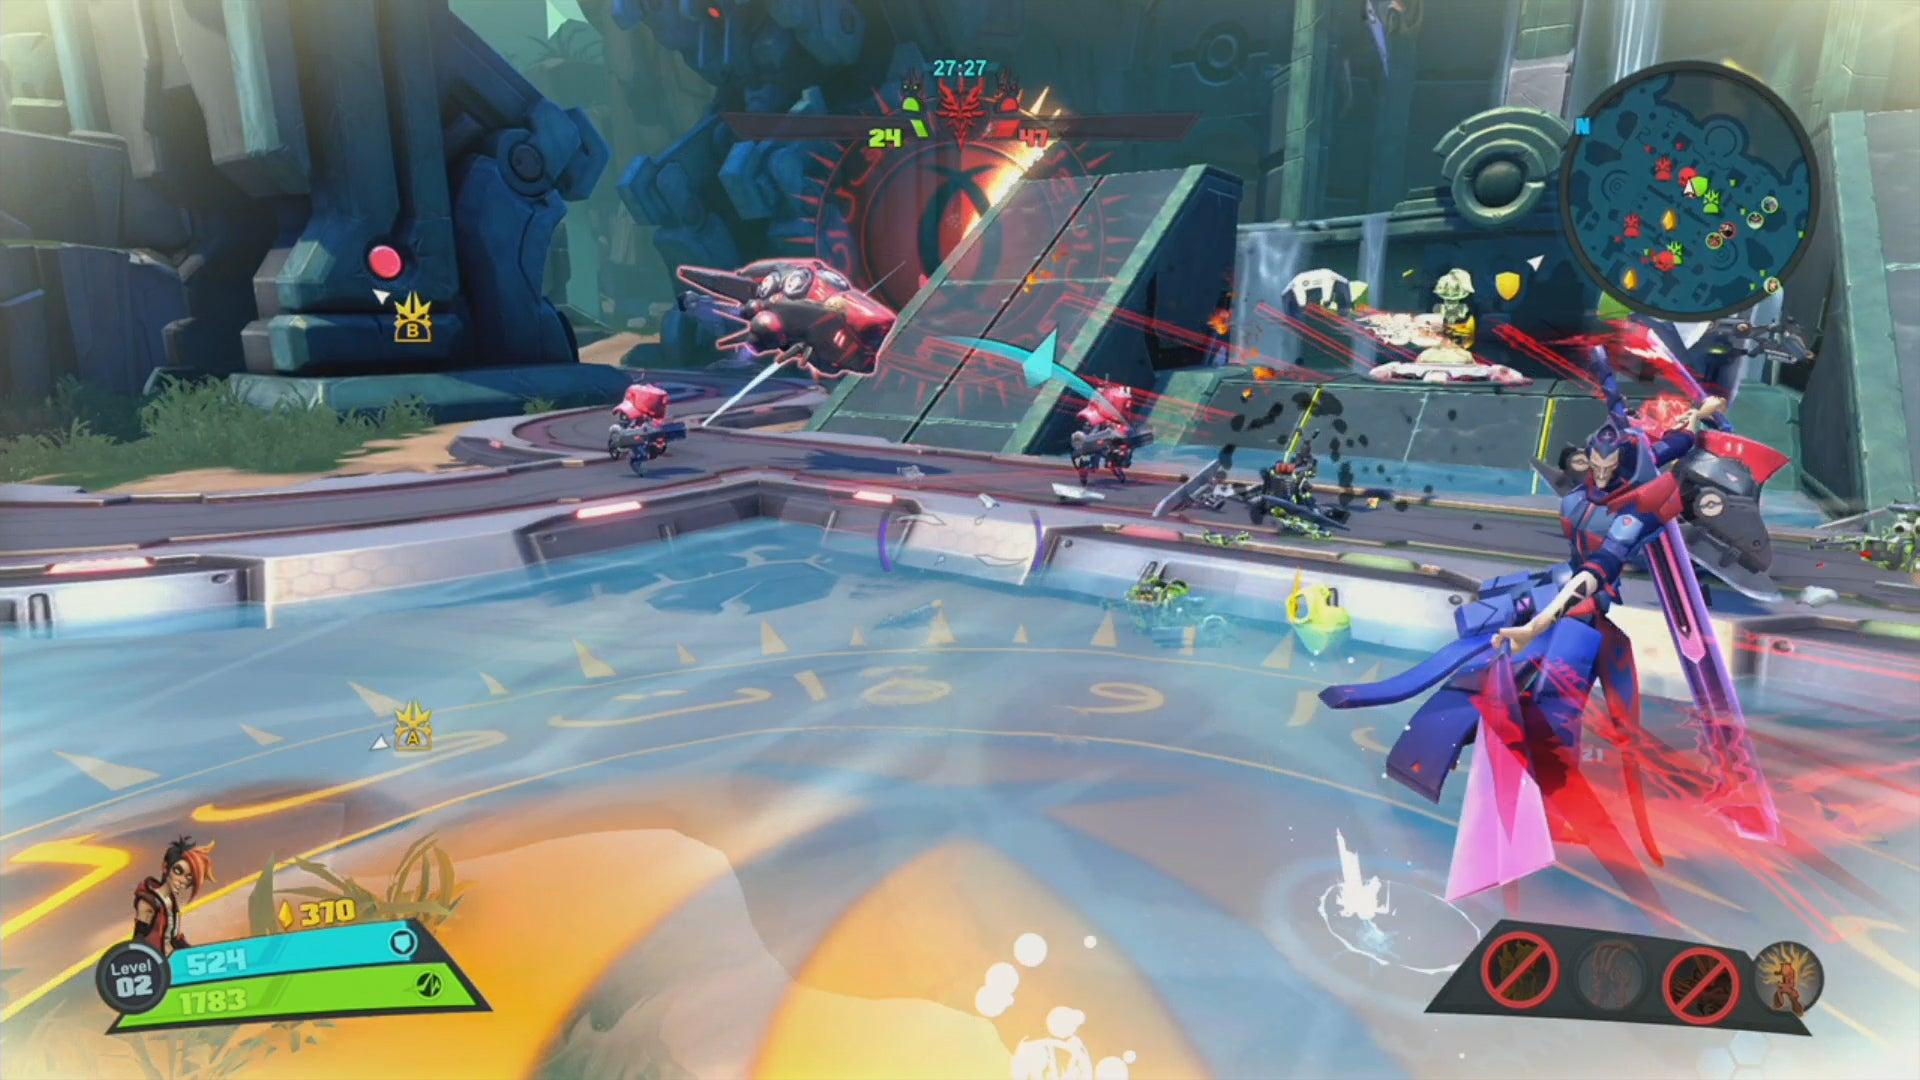 Battleborn: The Kotaku Review